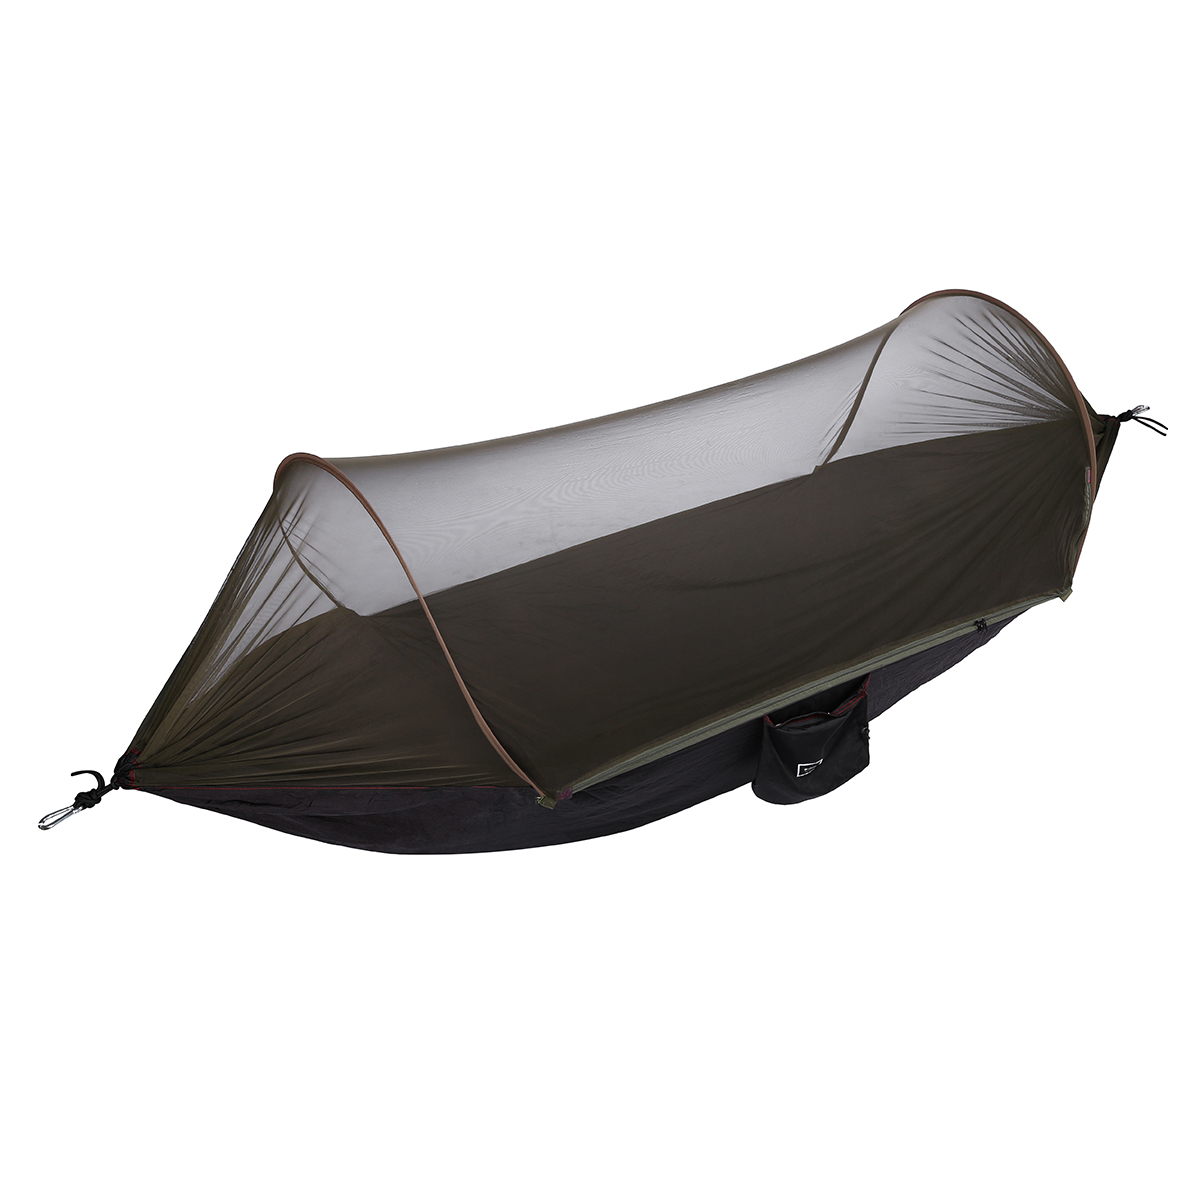 Mosquito Net Hammock Camping Portable Hiking Sleeping Bug